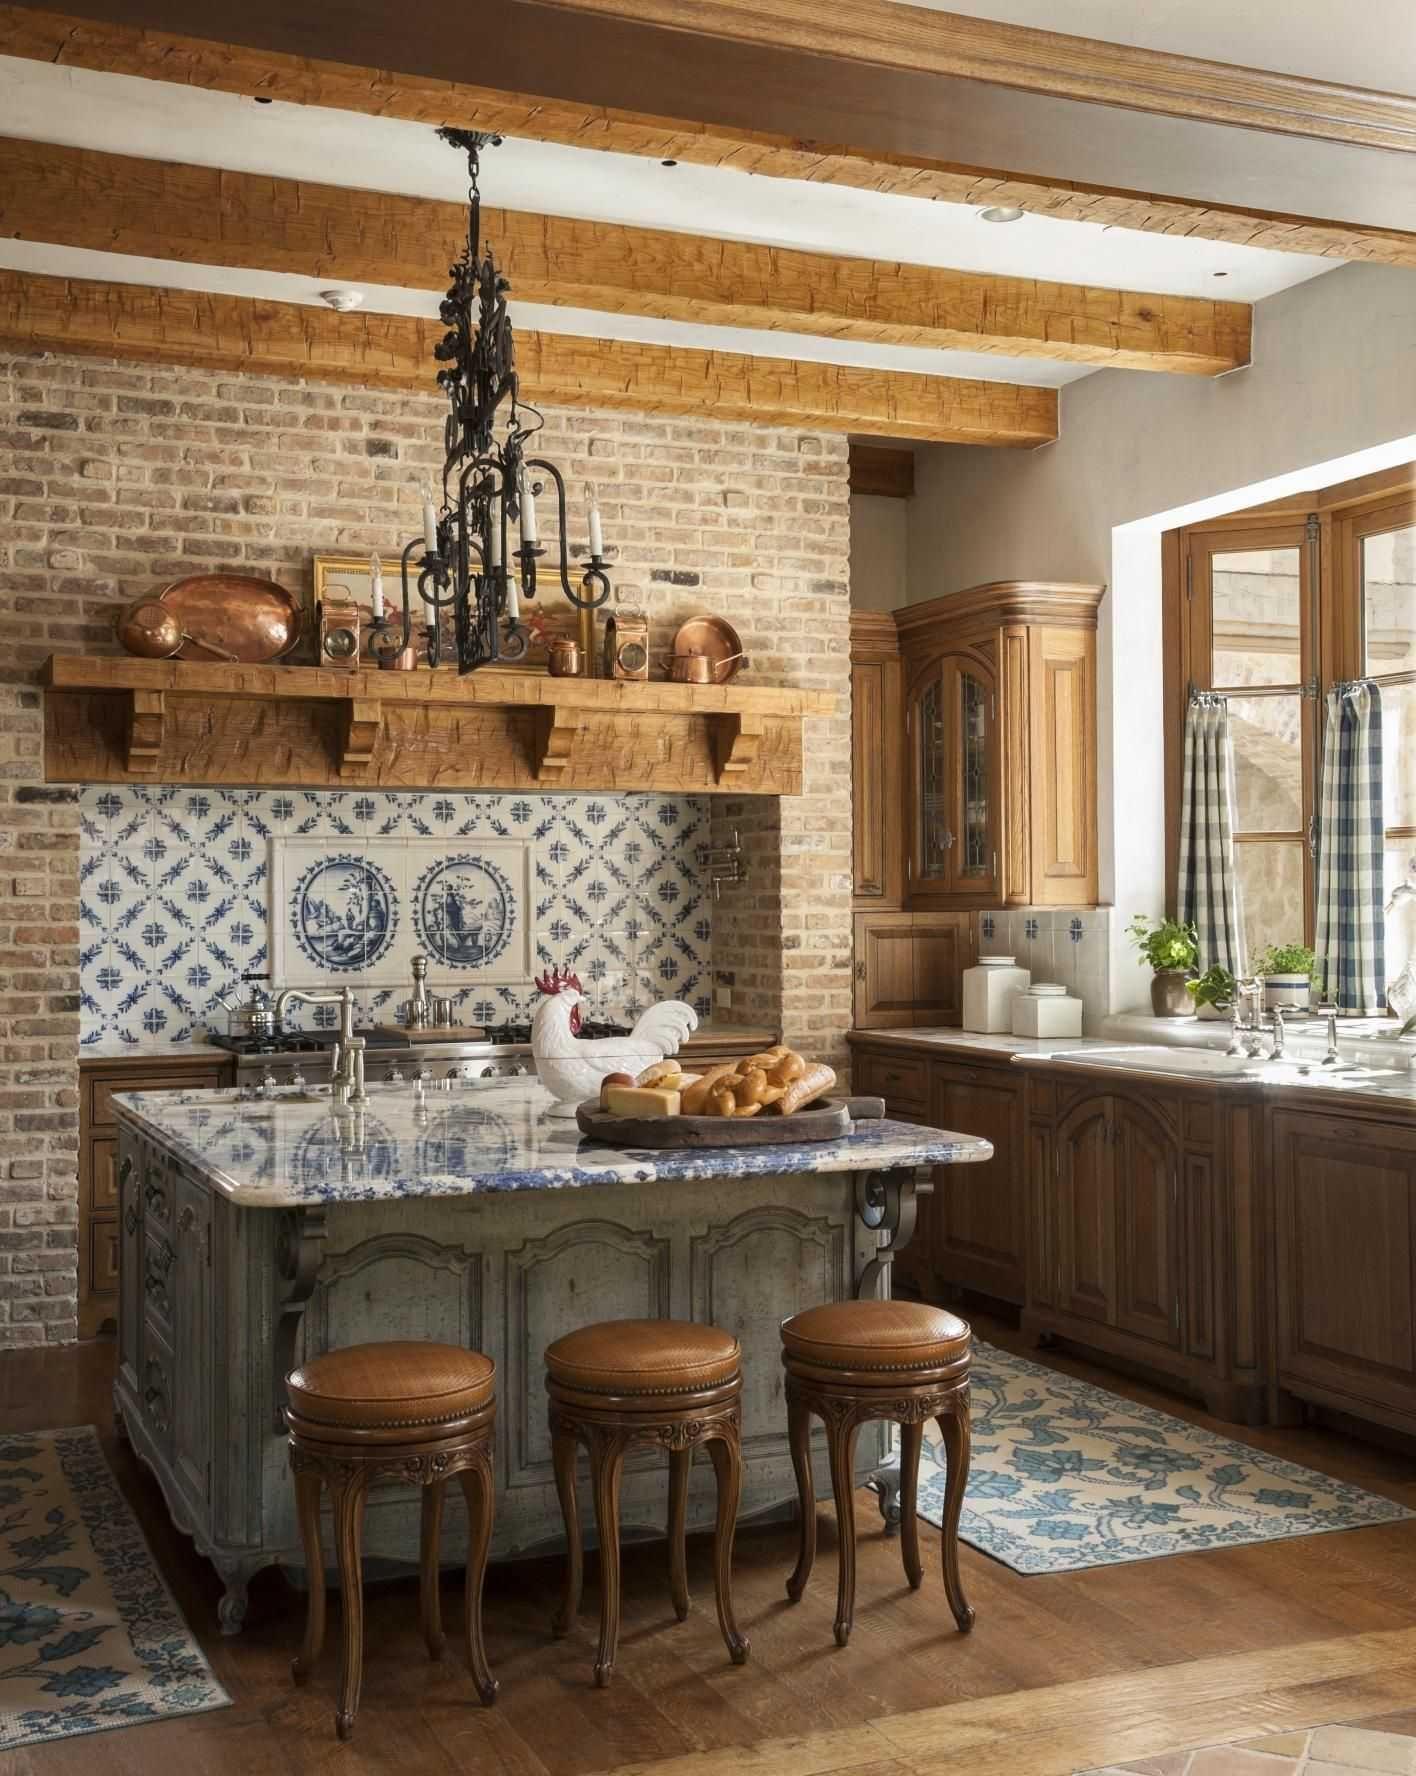 Irish Farmhouse Kitchen Beautiful Irish Farmhouse Kitchen Irish Home Design Modern S French Country Decorating Kitchen Country Style Kitchen Tuscan Kitchen